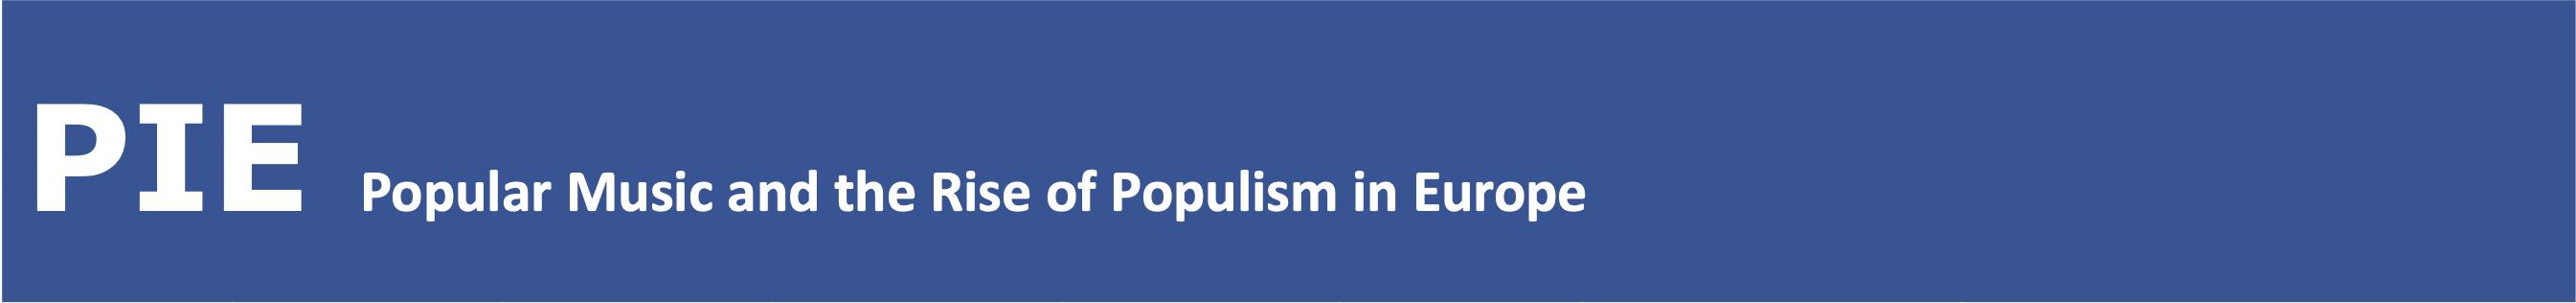 www.musicandpopulism.eu